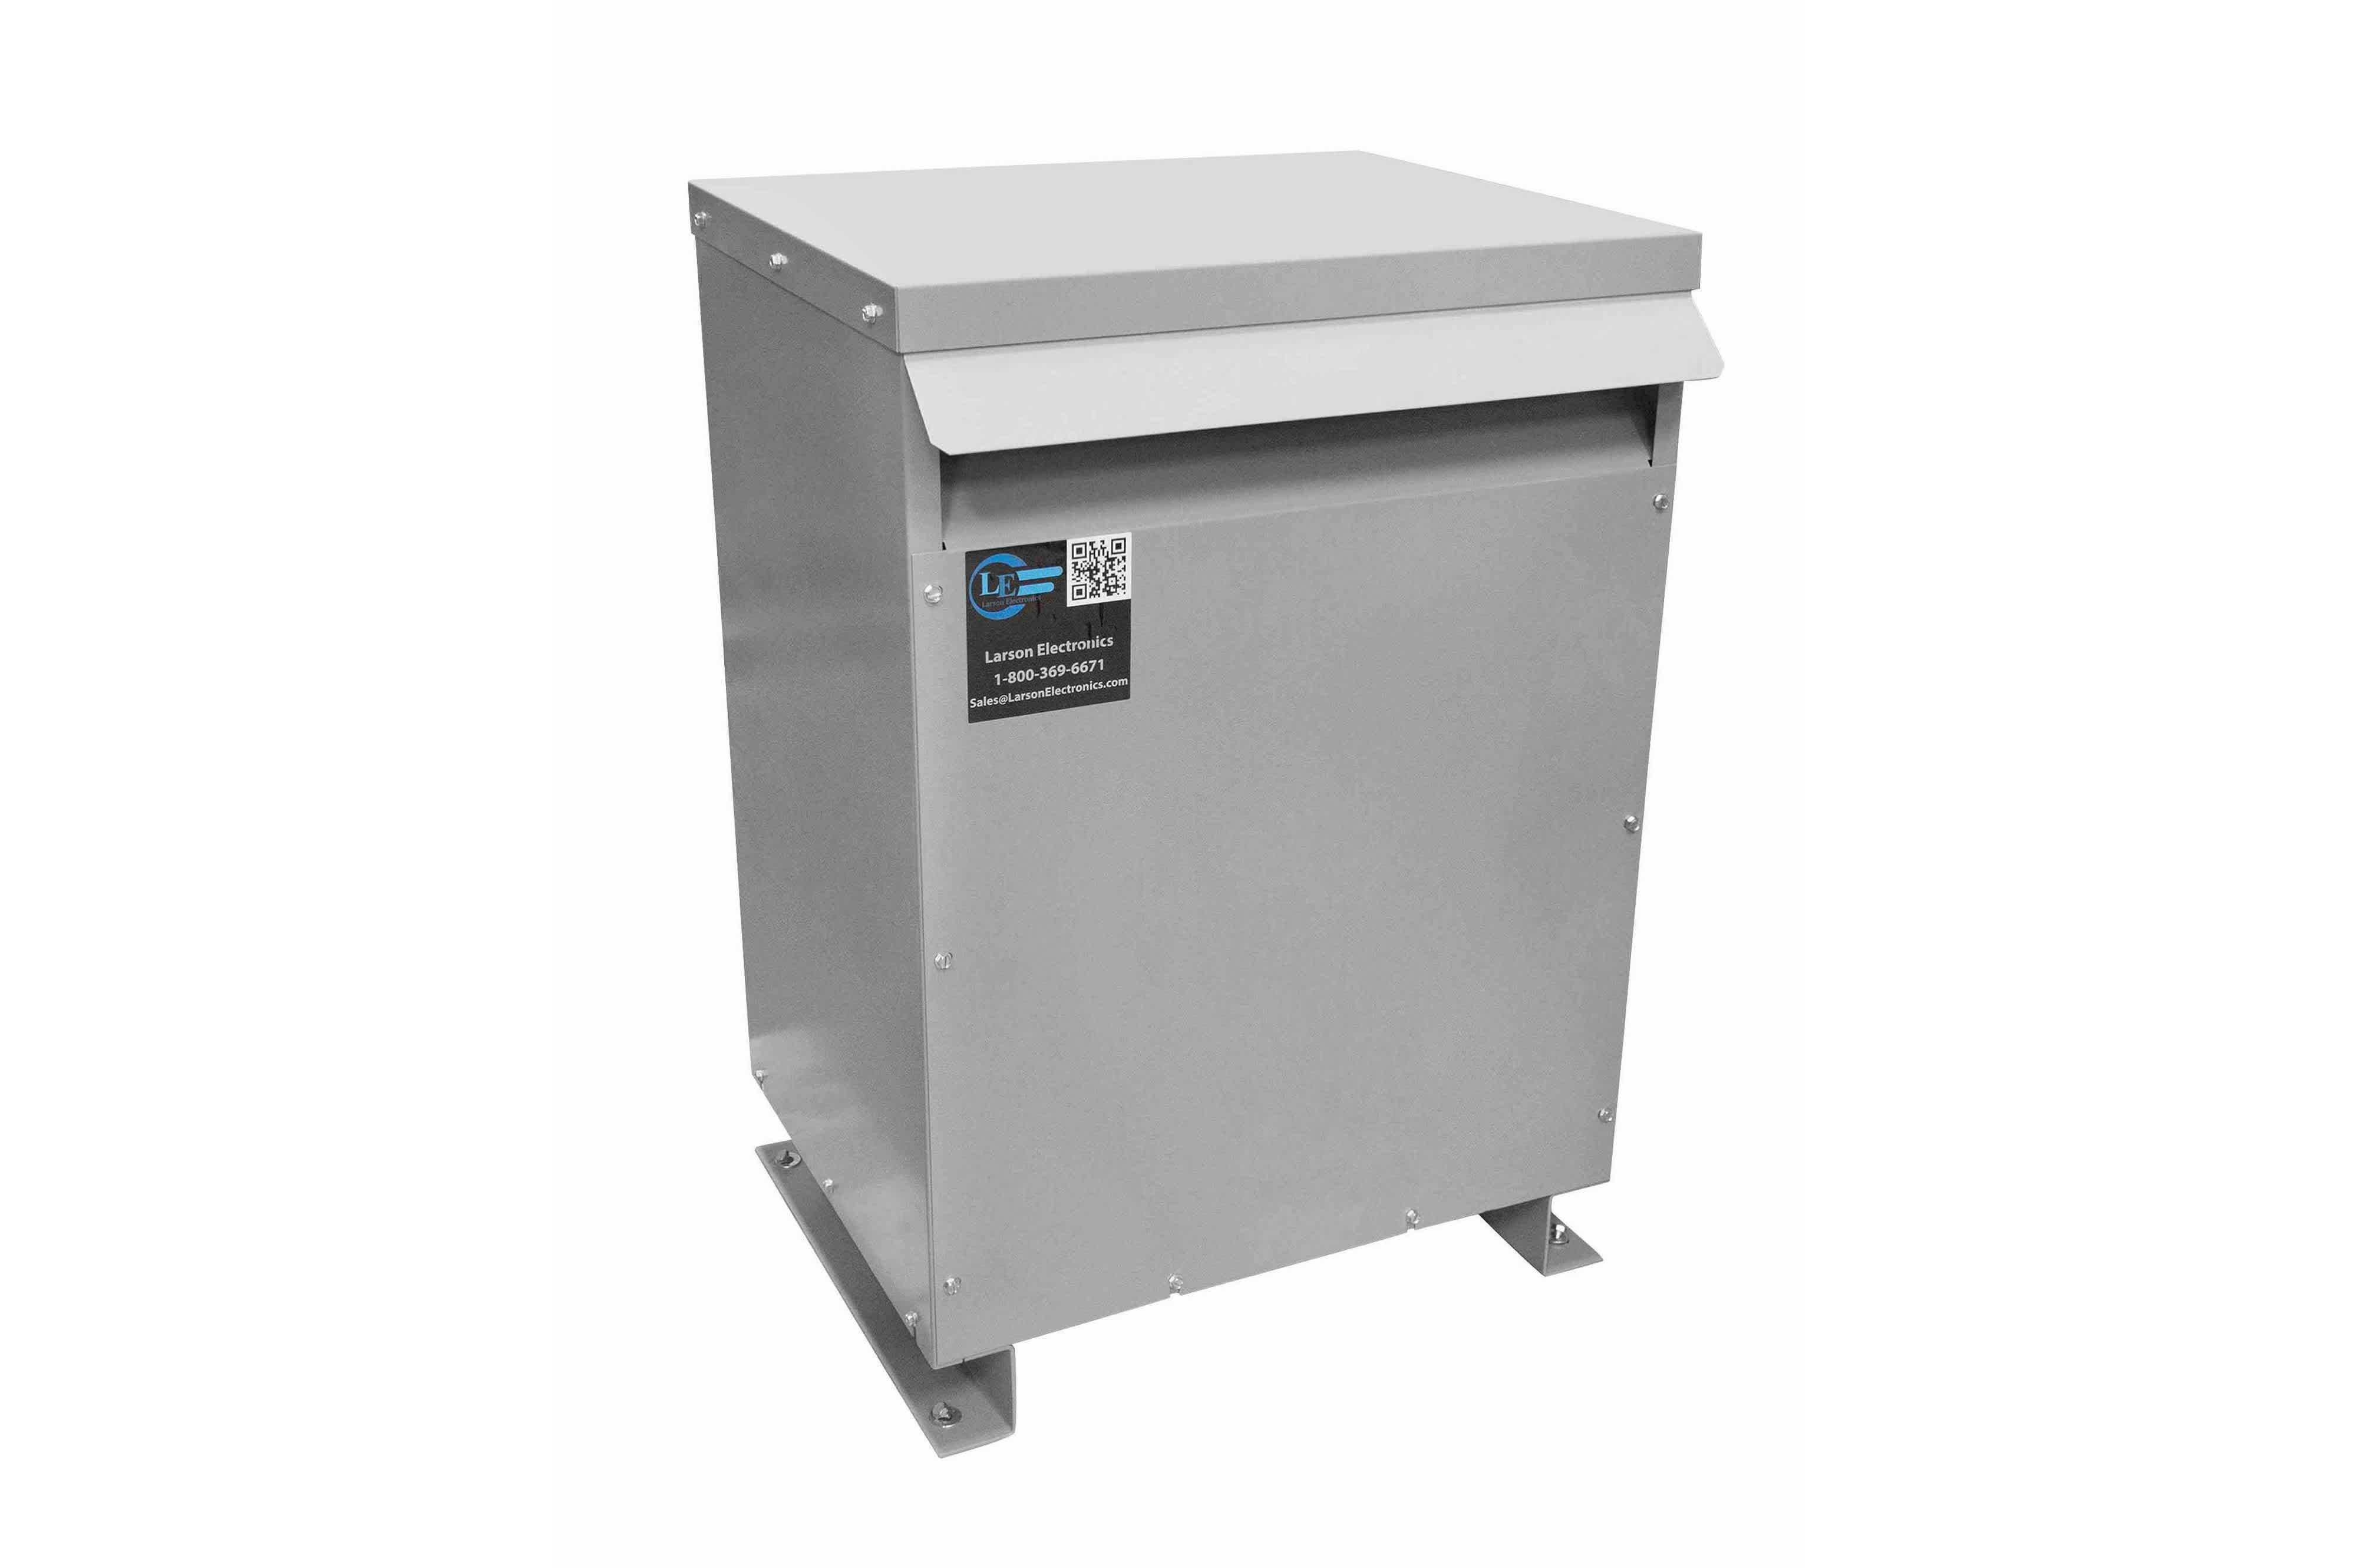 27 kVA 3PH Isolation Transformer, 600V Wye Primary, 380Y/220 Wye-N Secondary, N3R, Ventilated, 60 Hz